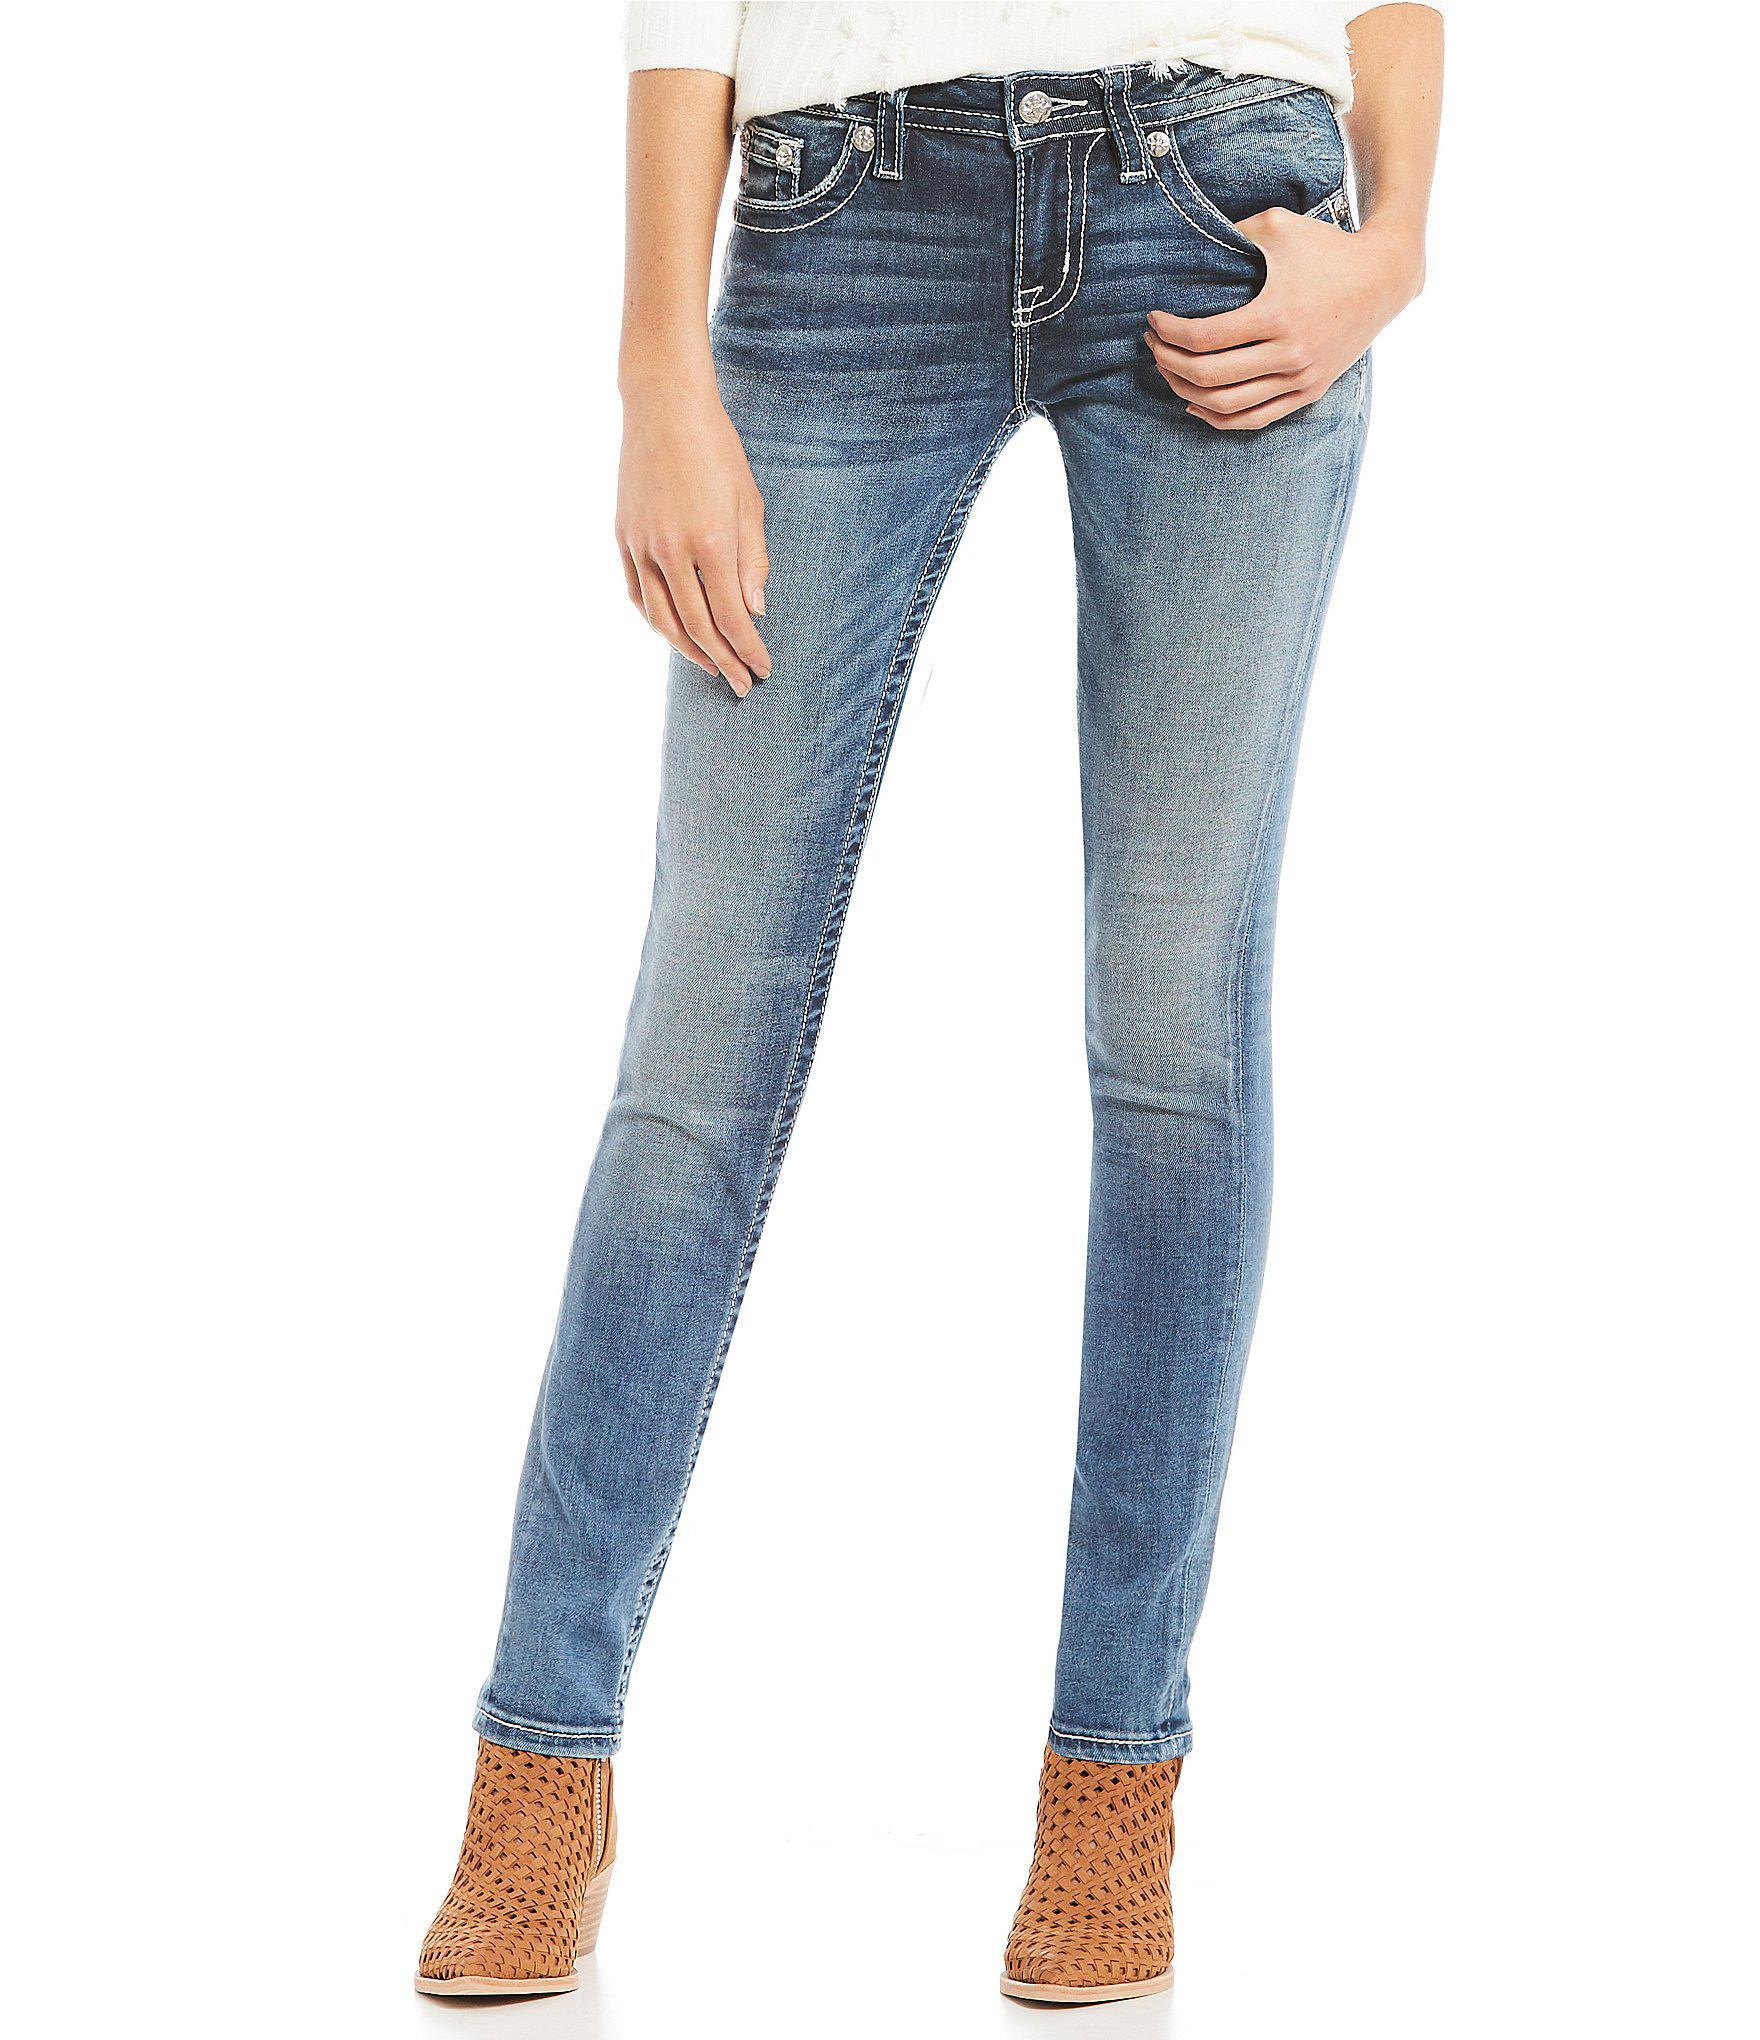 8ae5d6db333 Lyst - Miss Me Flower Wing Pocket Skinny Jeans in Blue